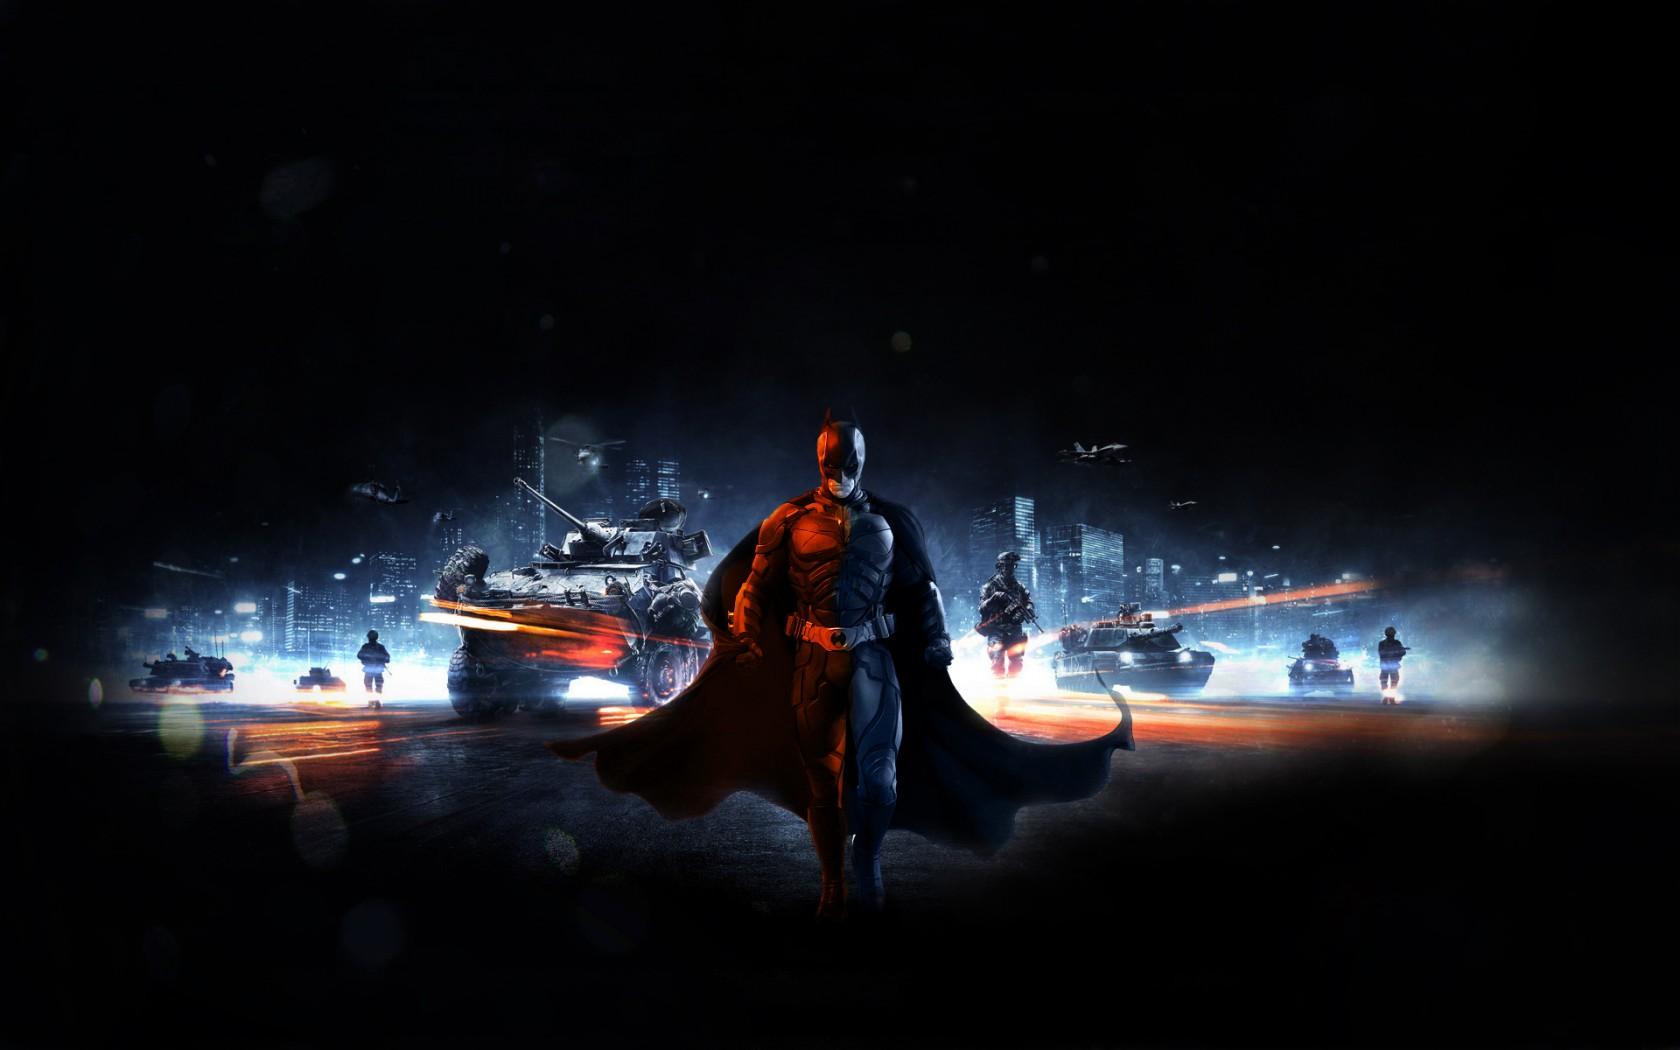 Арт к игре Battlefield 3